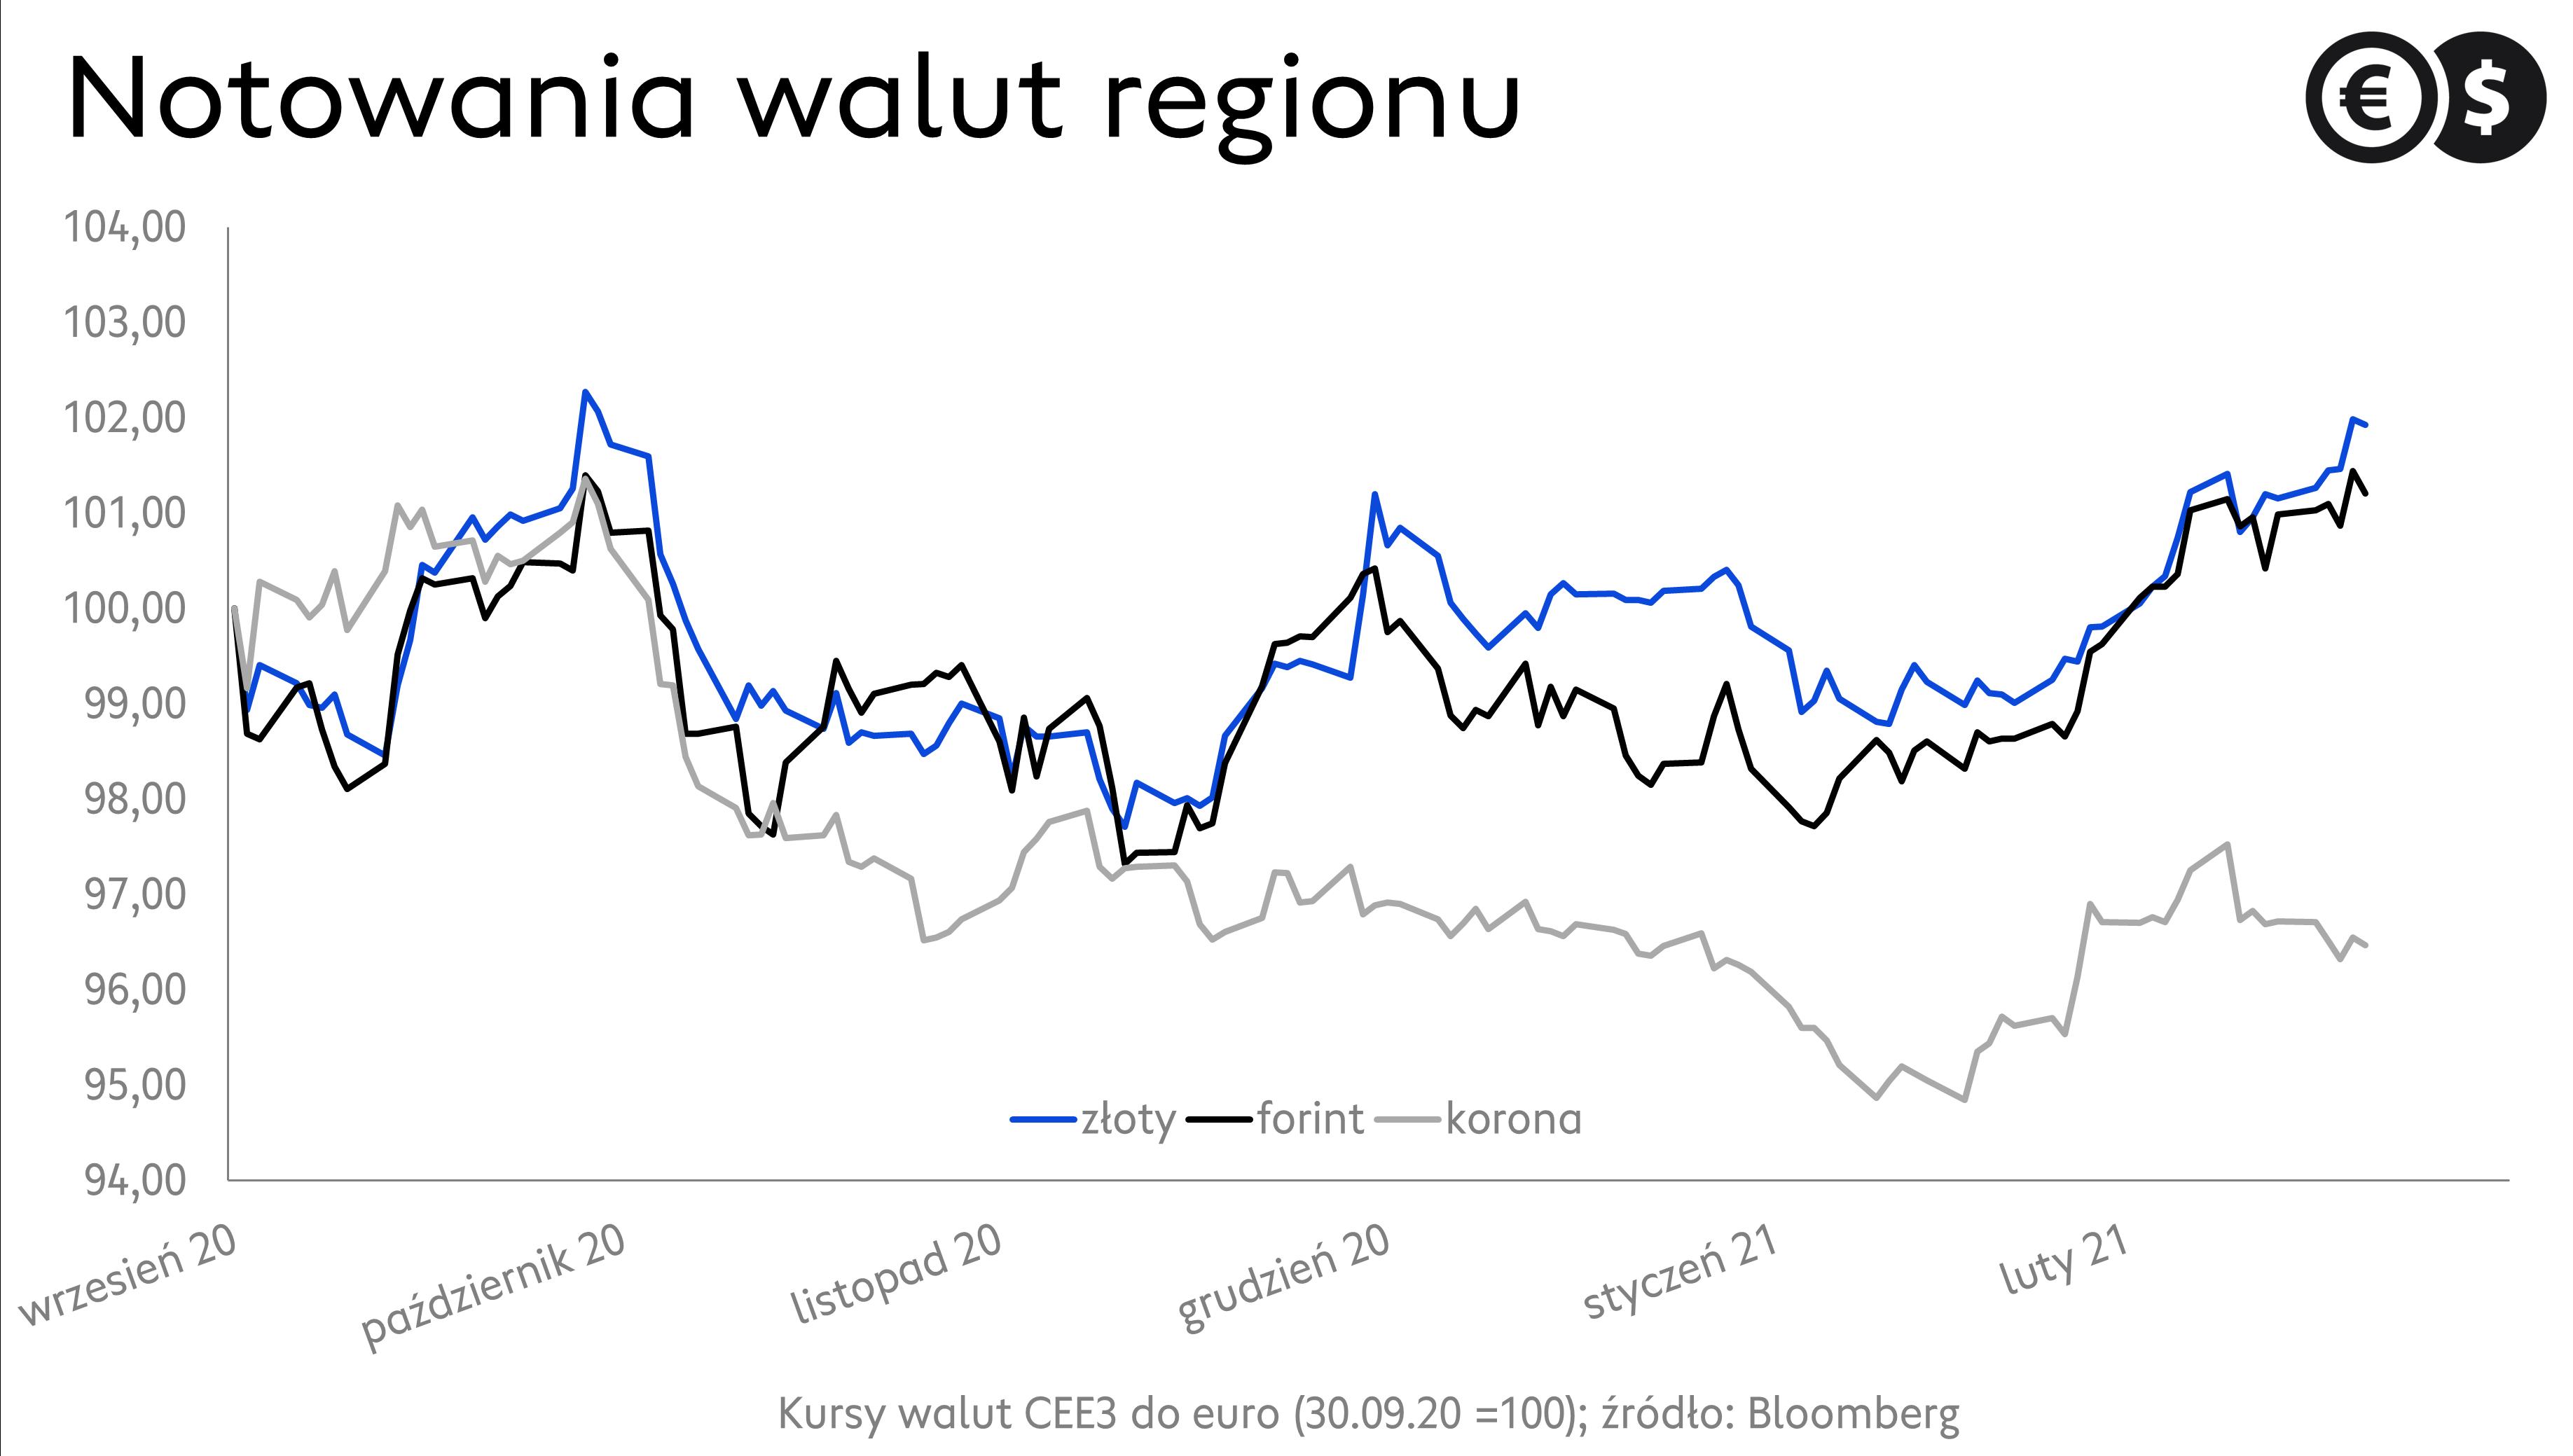 Kursy walut, wykres EUR/PLN, EUR/HUF i EUR/CZK; źródło: Bloomberg